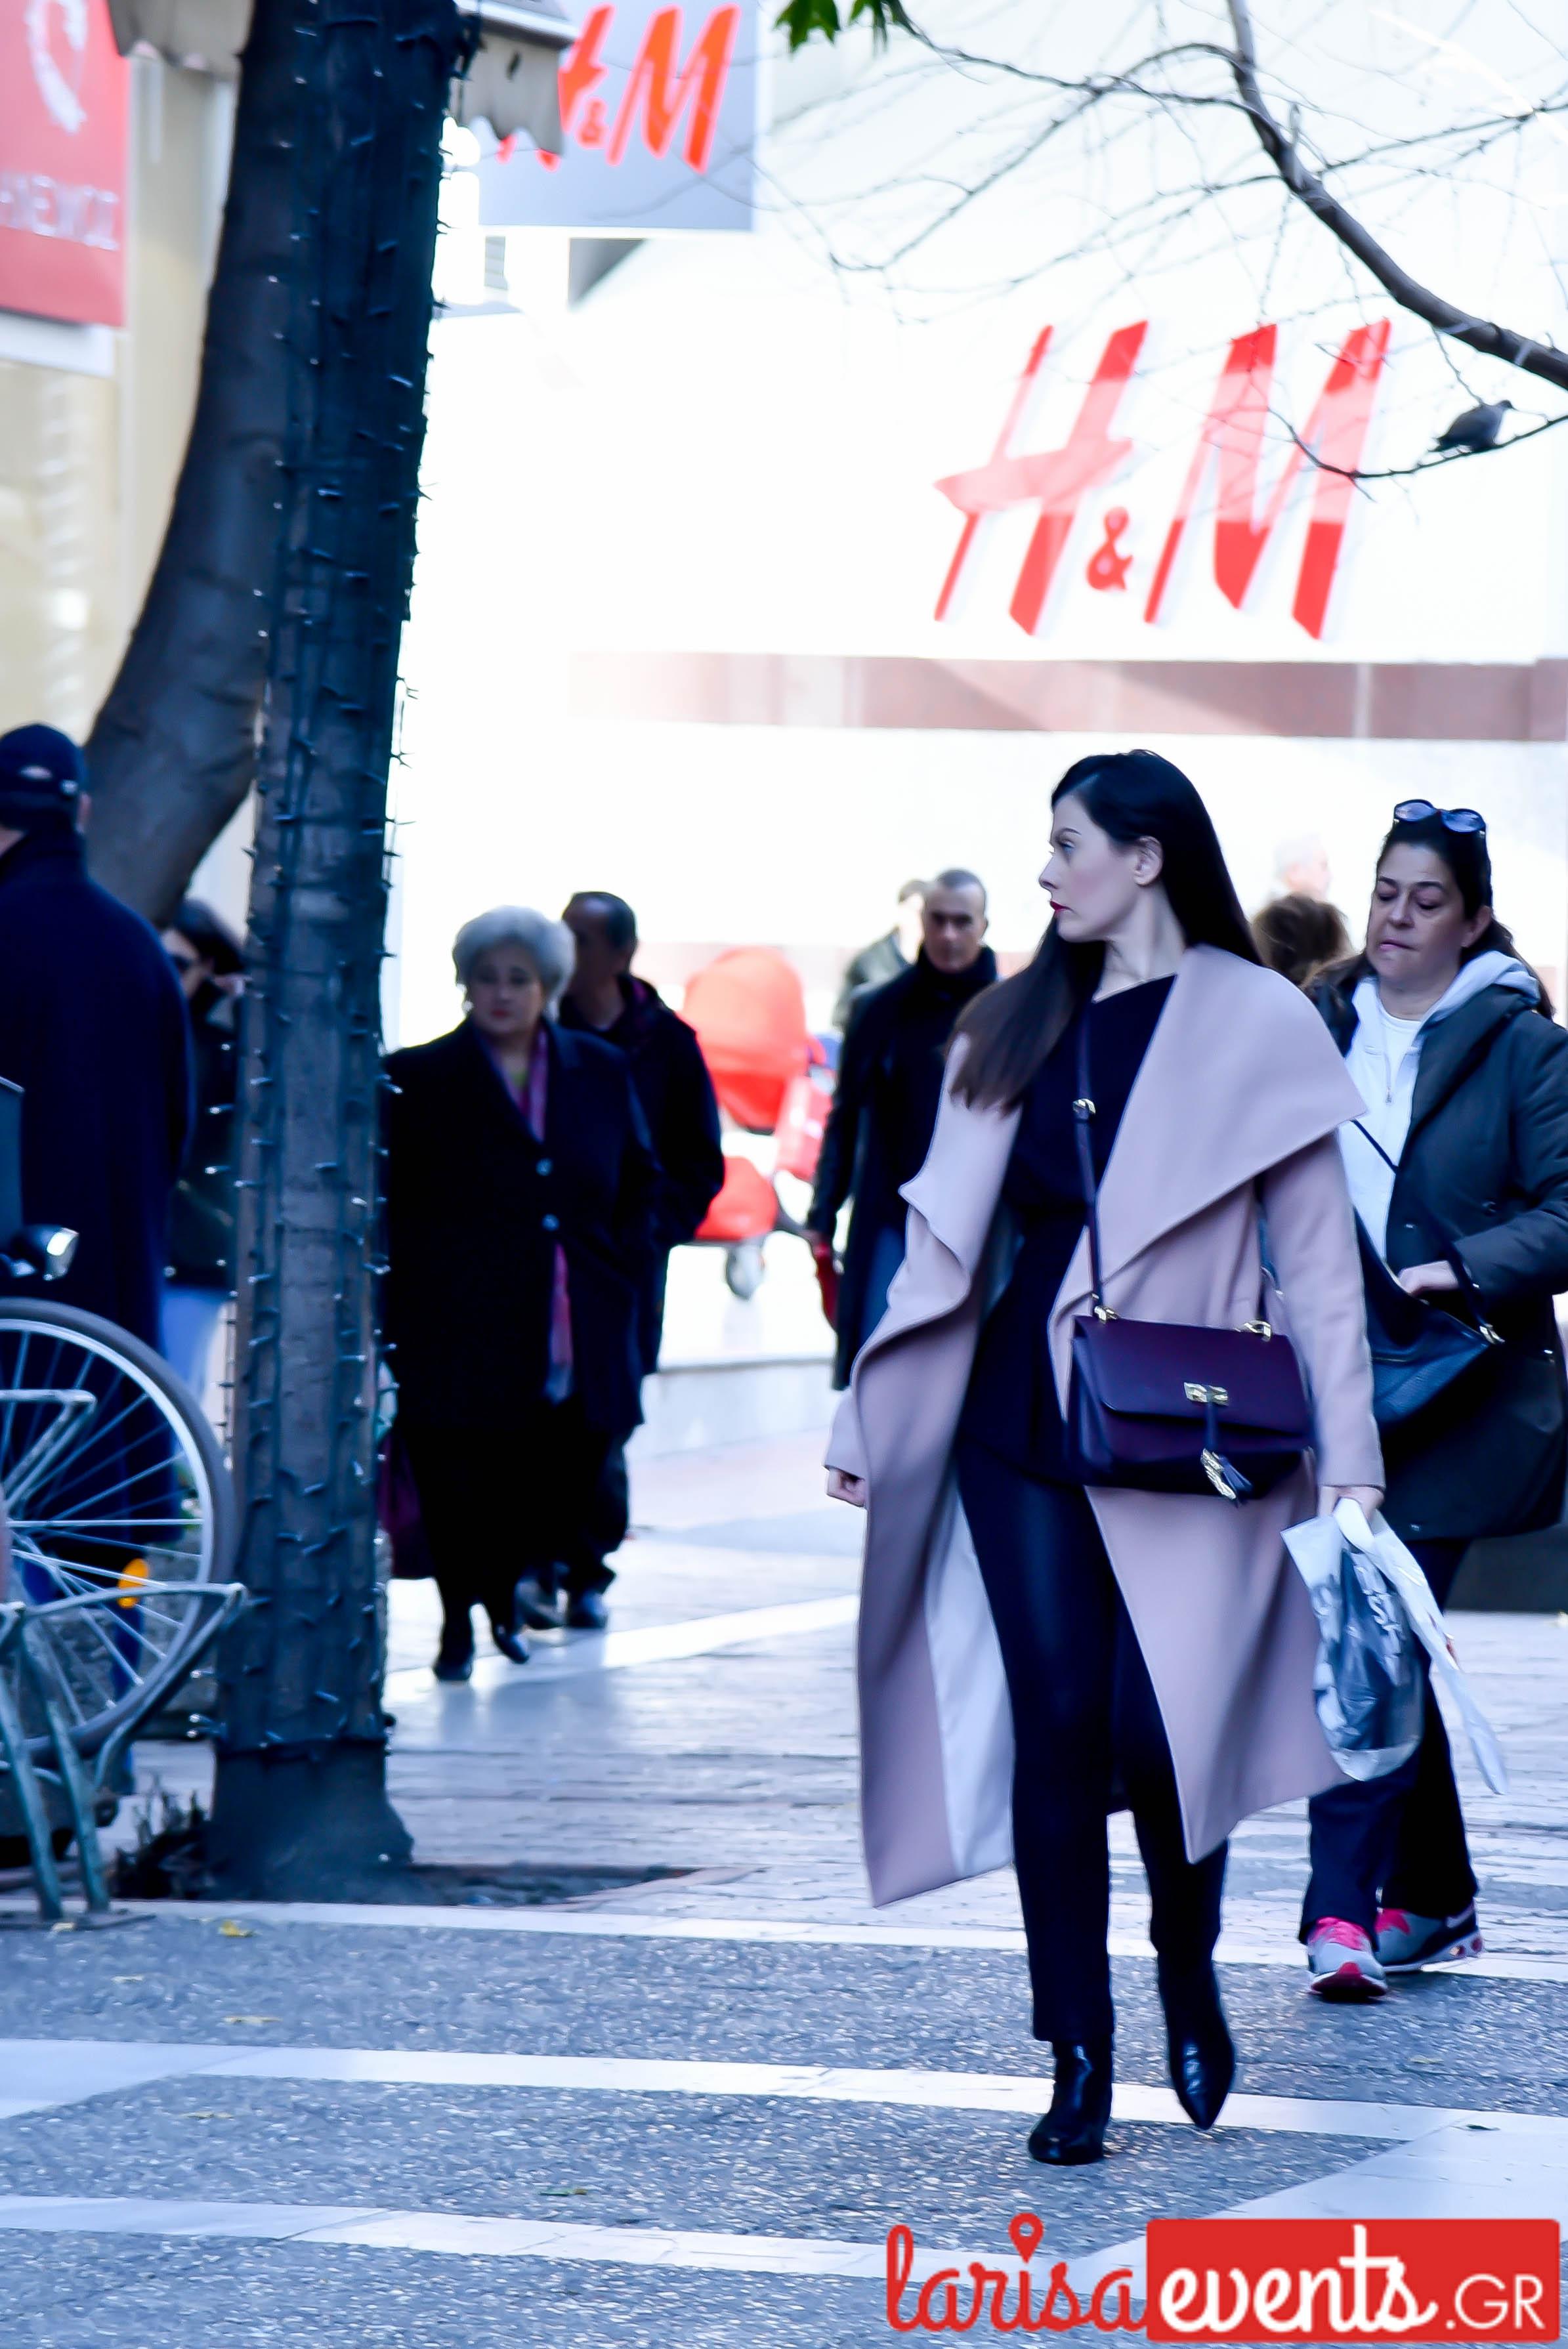 LAZ 7368 - Λάρισα's Street Style | Οι γυναίκες της πόλης σε street style clicks!